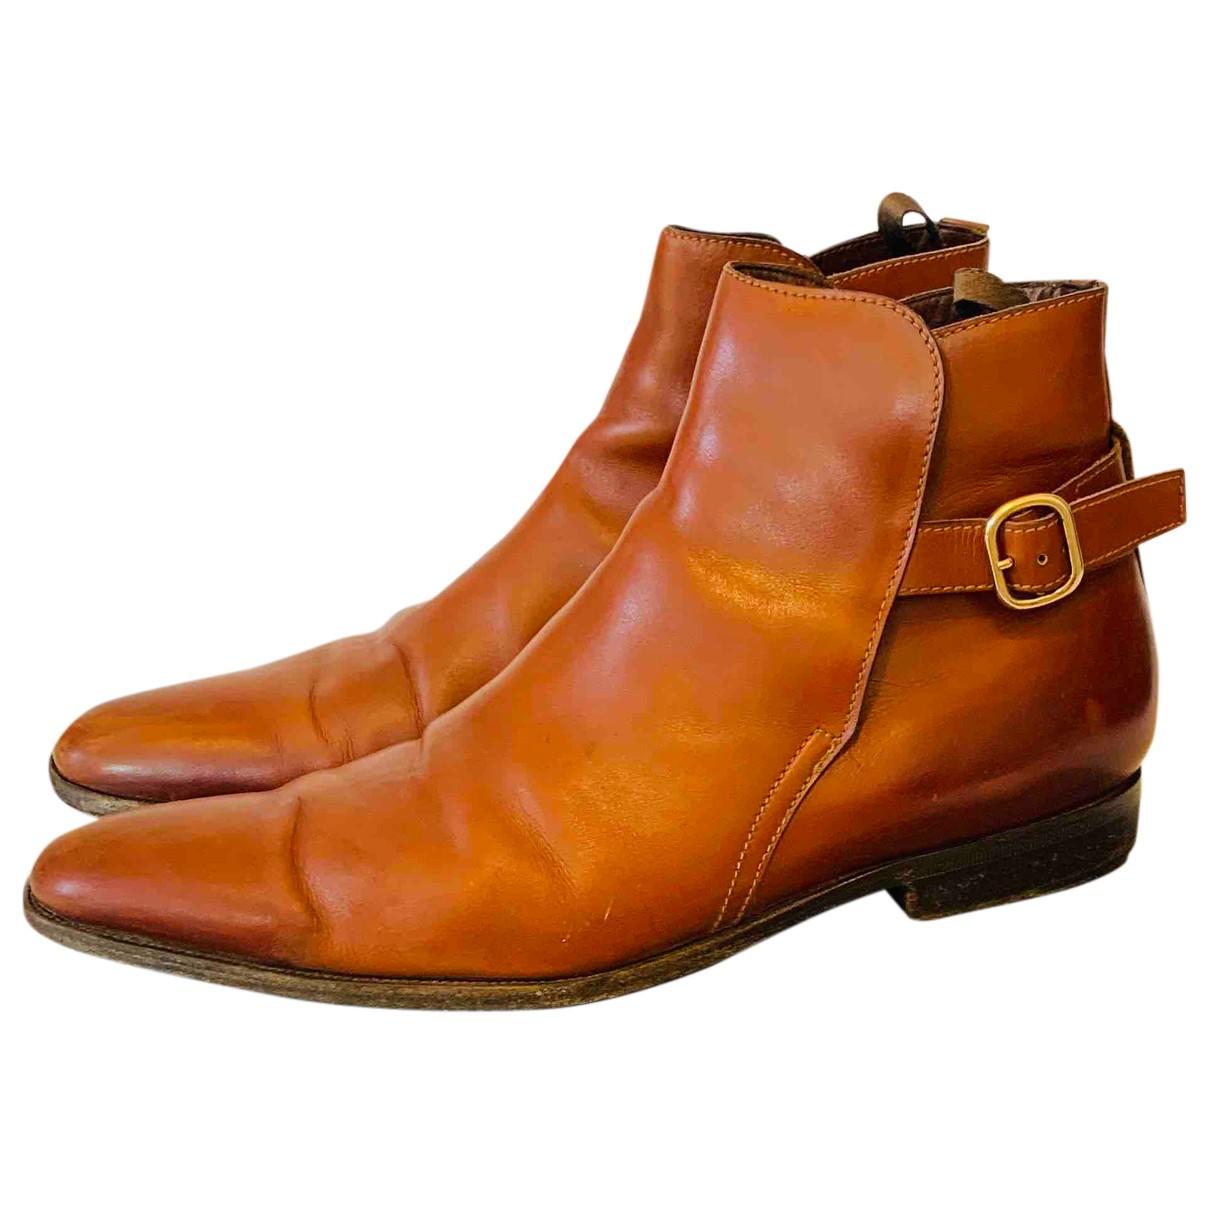 Miu Miu - Bottes.Boots   pour homme en cuir - marron